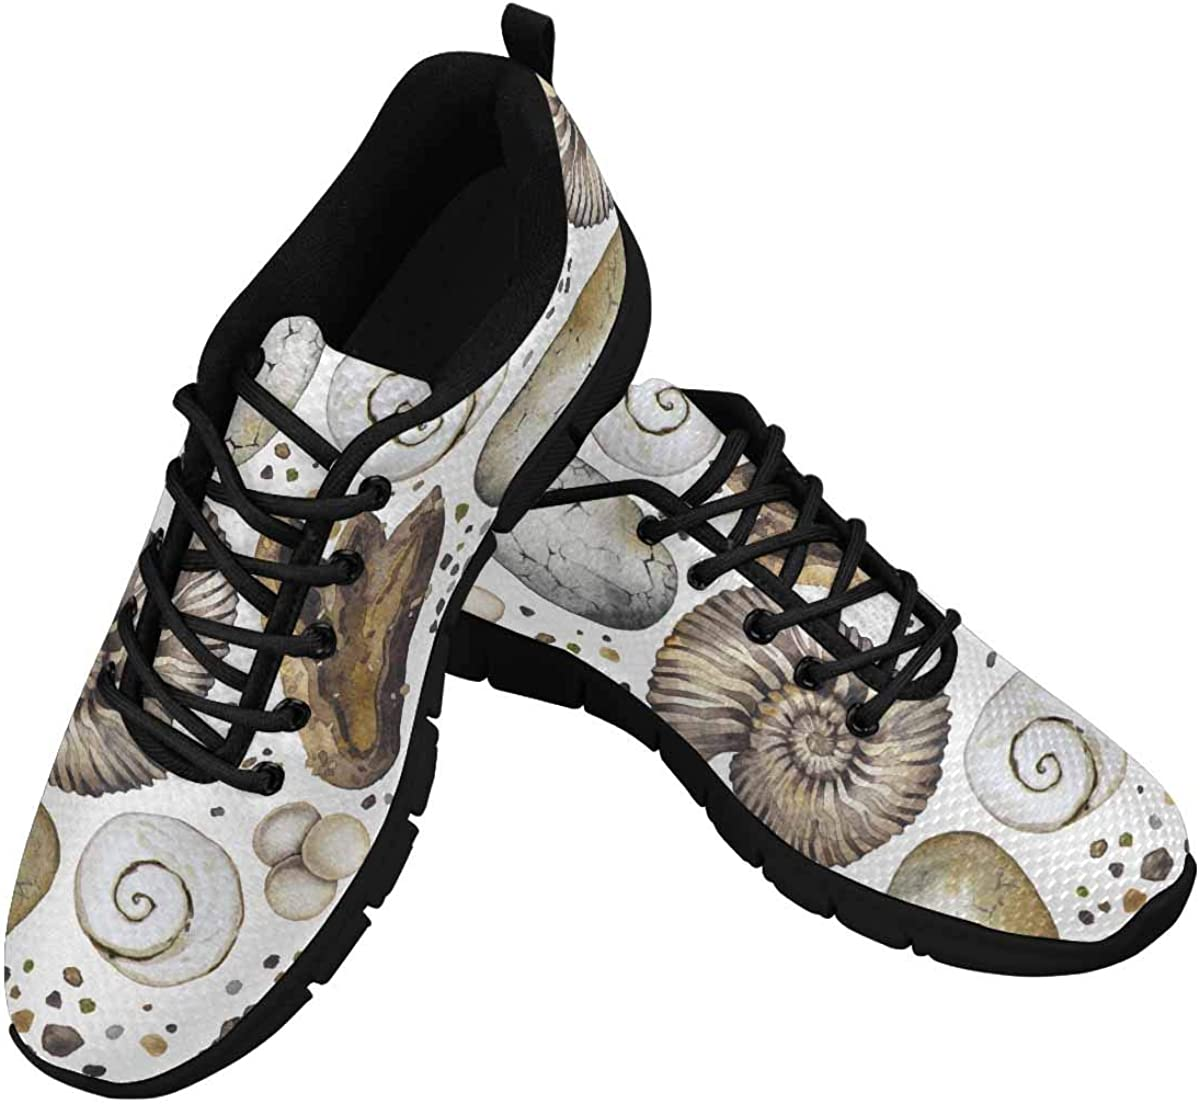 INTERESTPRINT Vintage Seashell Pattern Women's Athletic Walking Running Sneakers Comfortable Lightweight Shoes